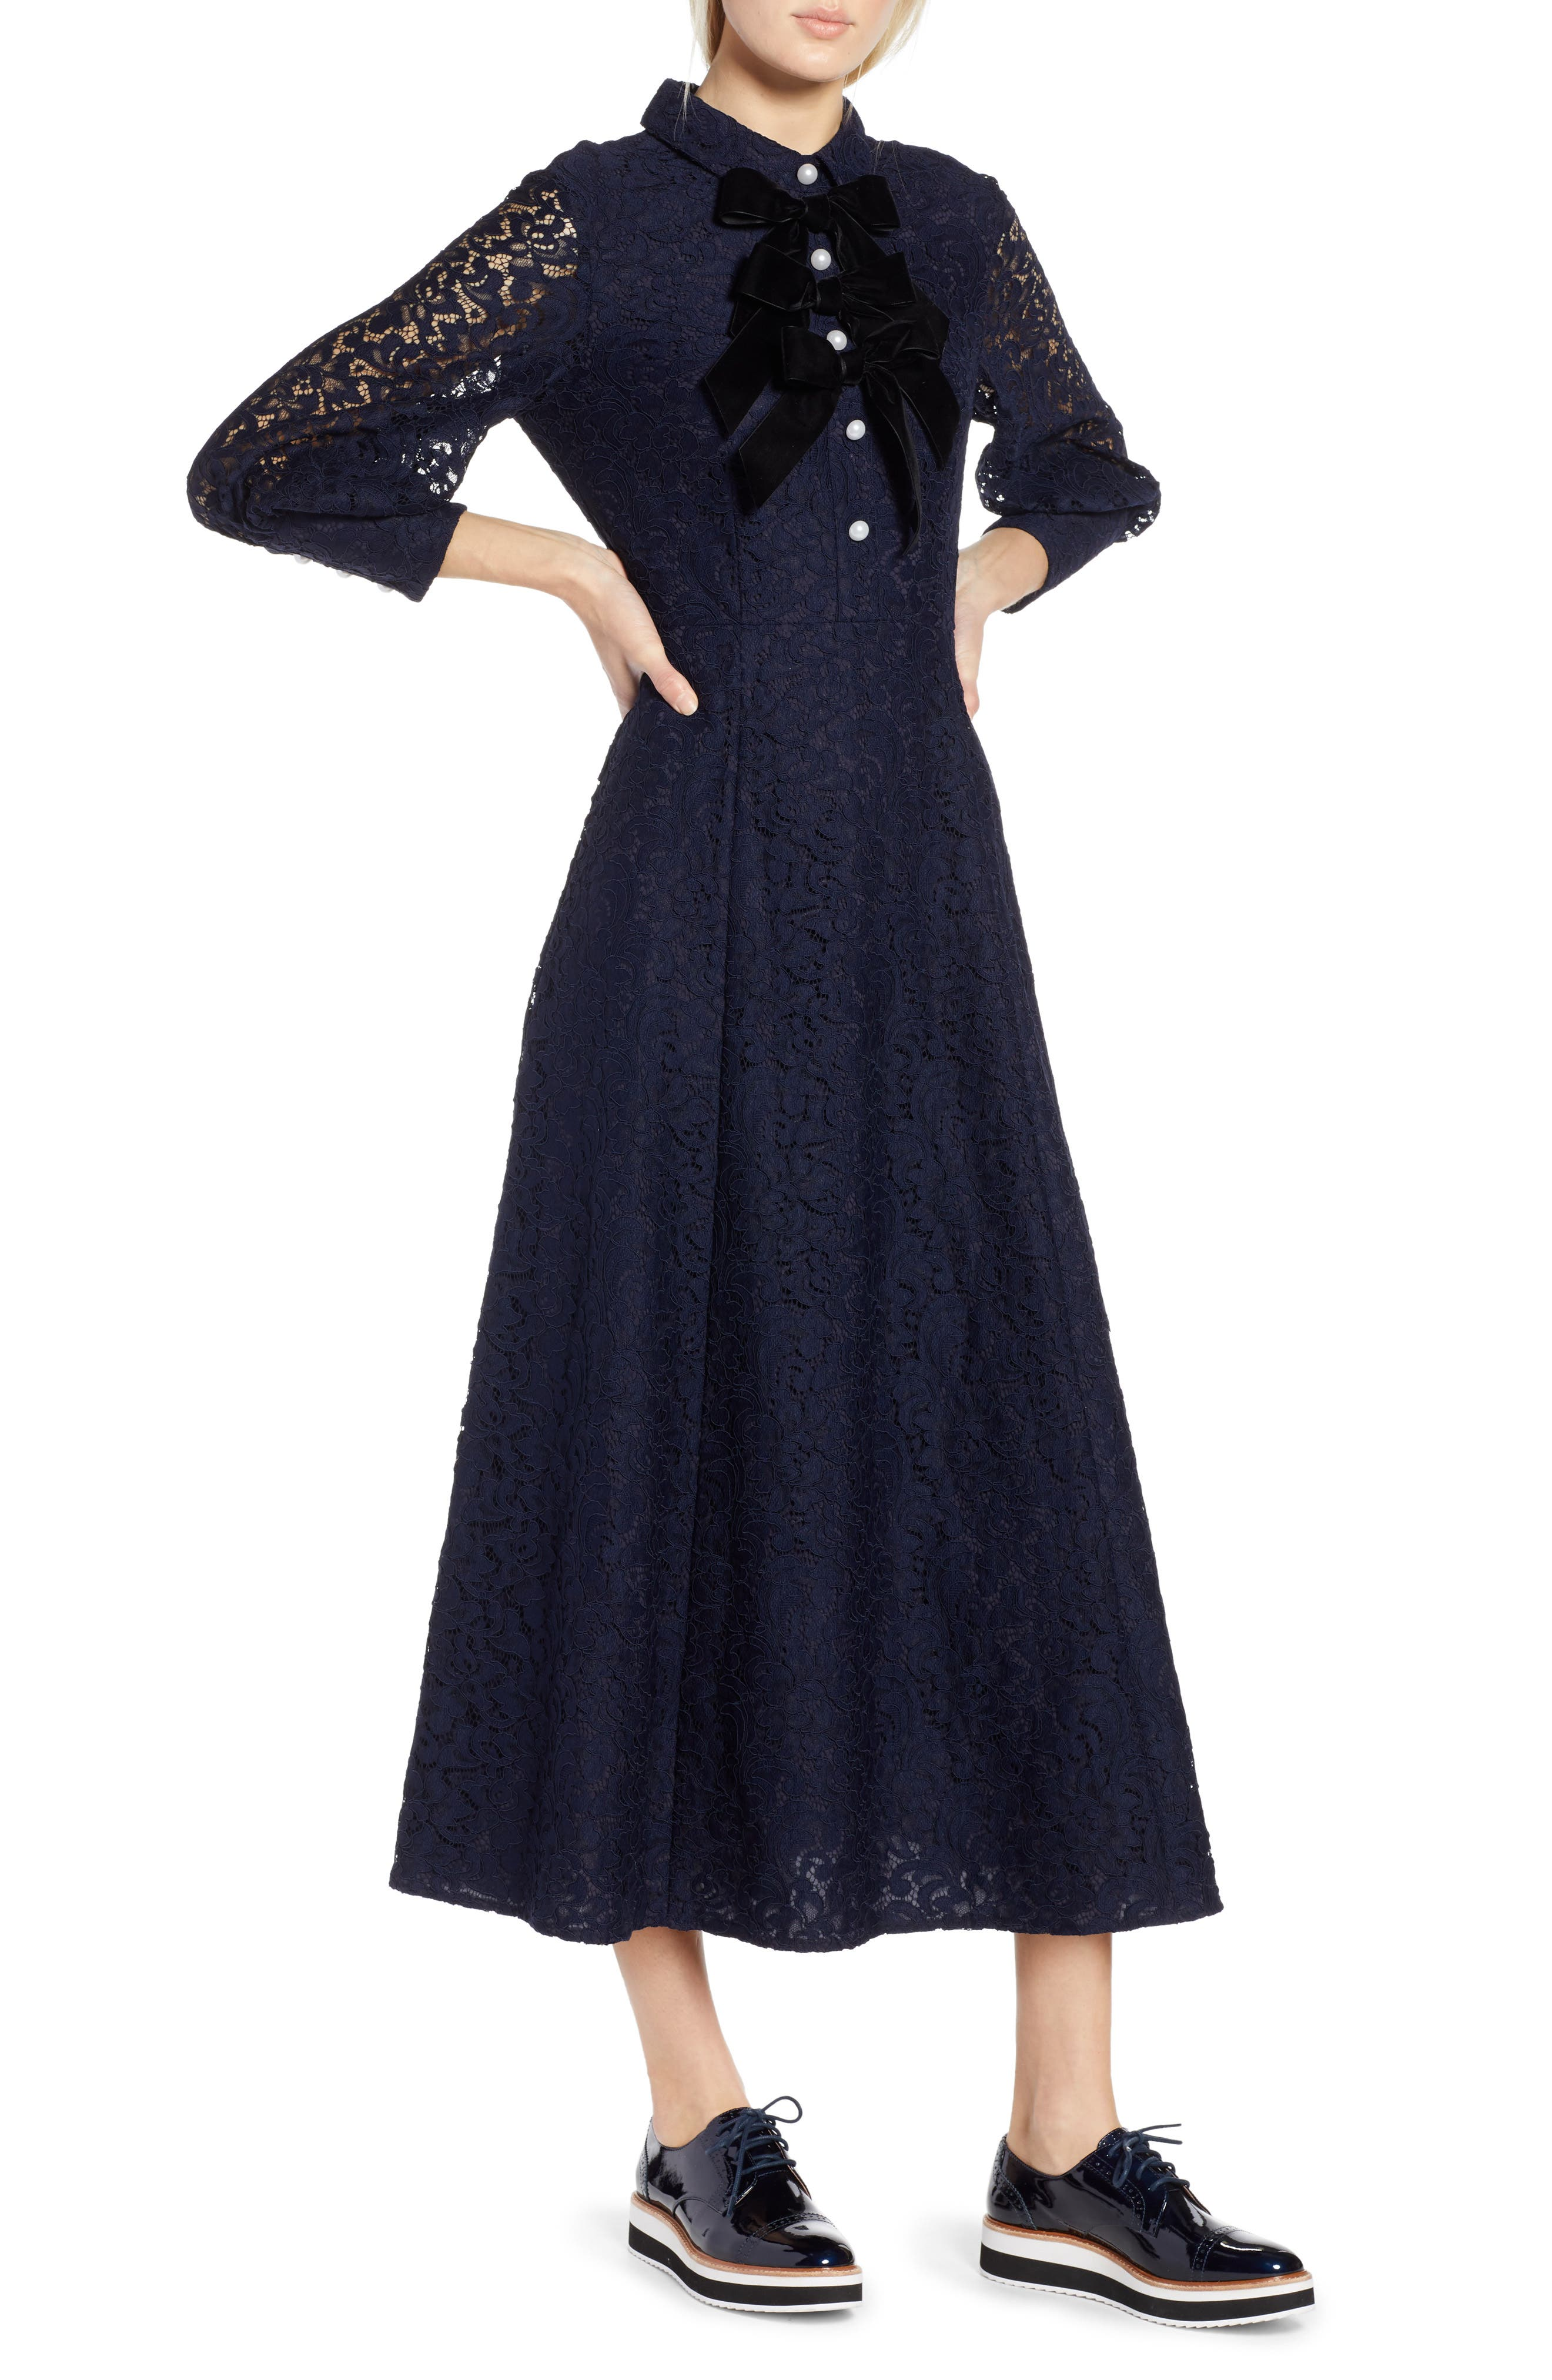 x Atlantic-Pacific Bow Detail Lace Midi Dress,                             Main thumbnail 1, color,                             NAVY